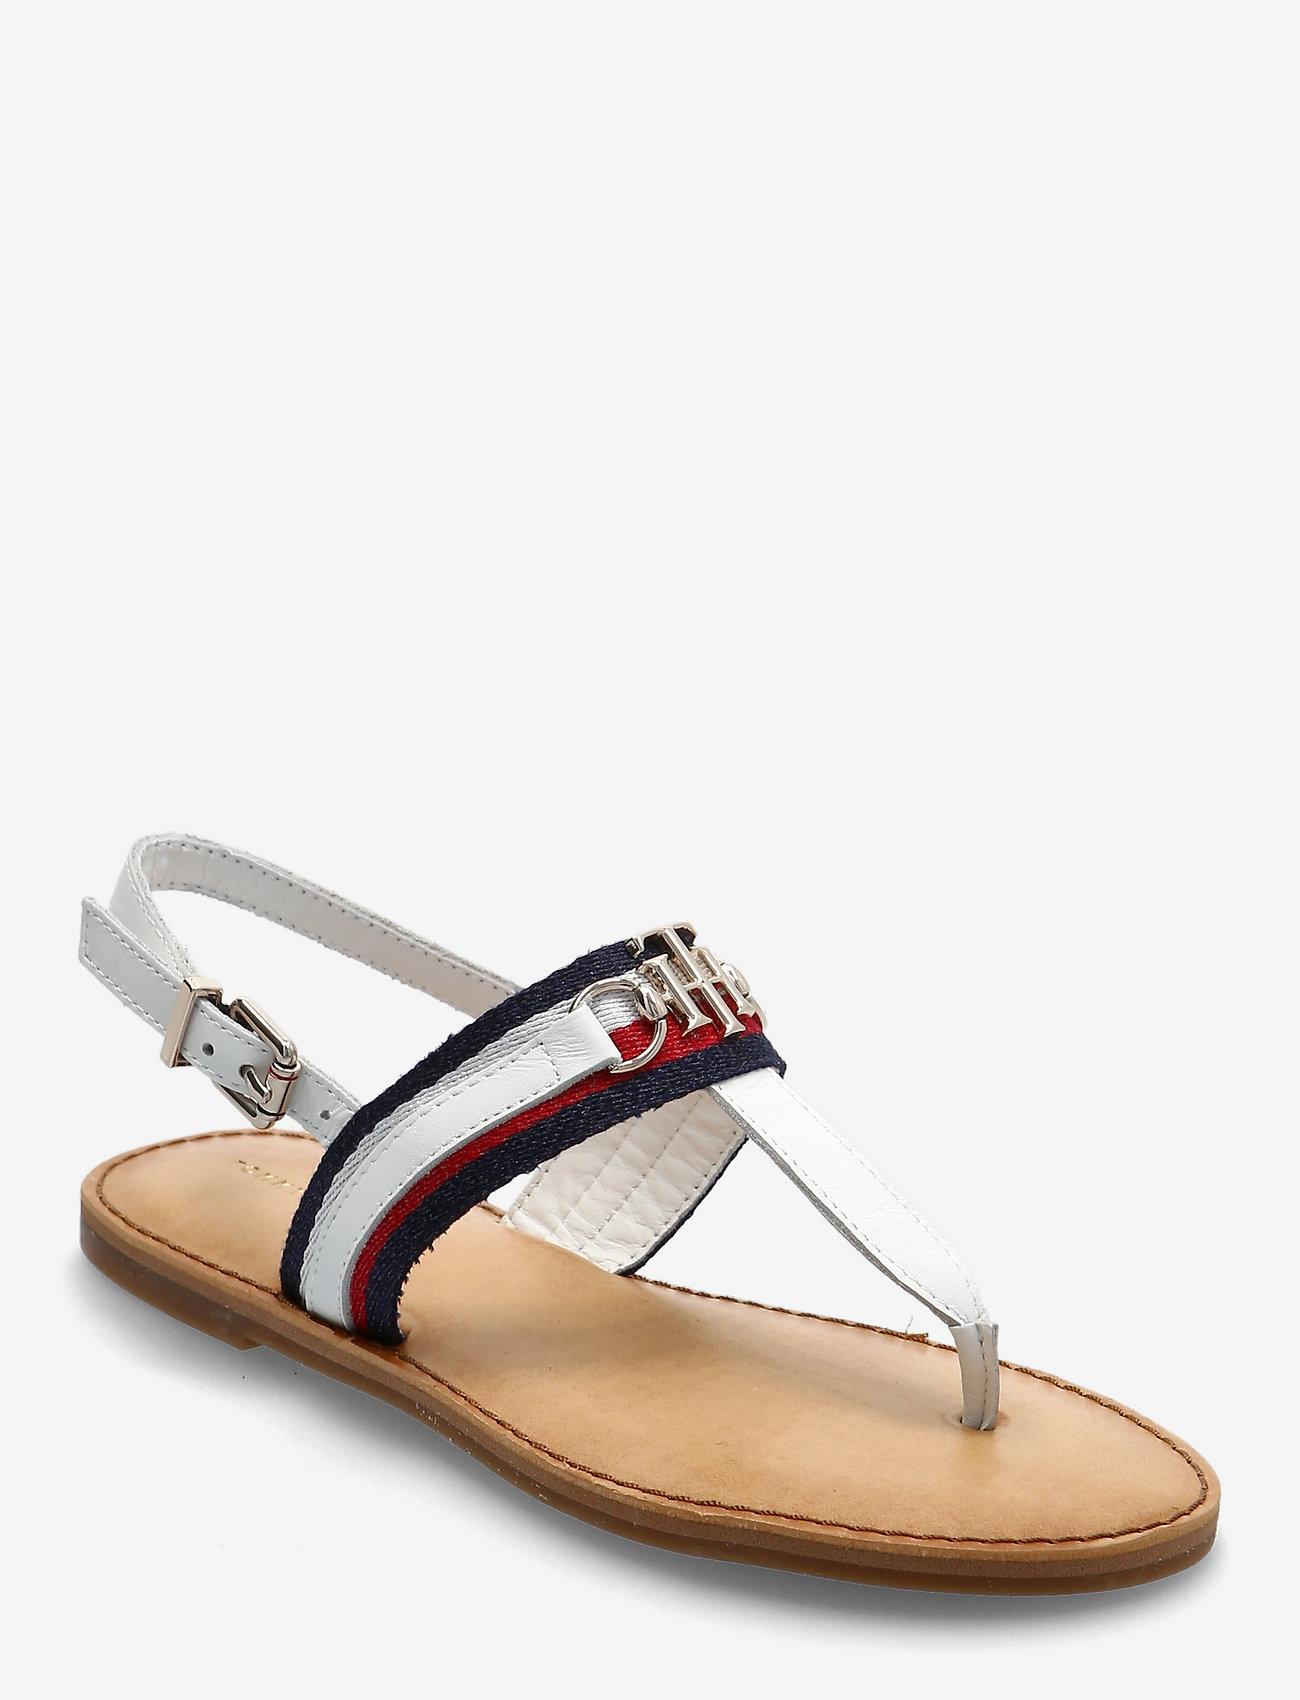 Tommy Hilfiger - SHIMMERY RIBBON FLAT SANDAL - flat sandals - ecru - 0